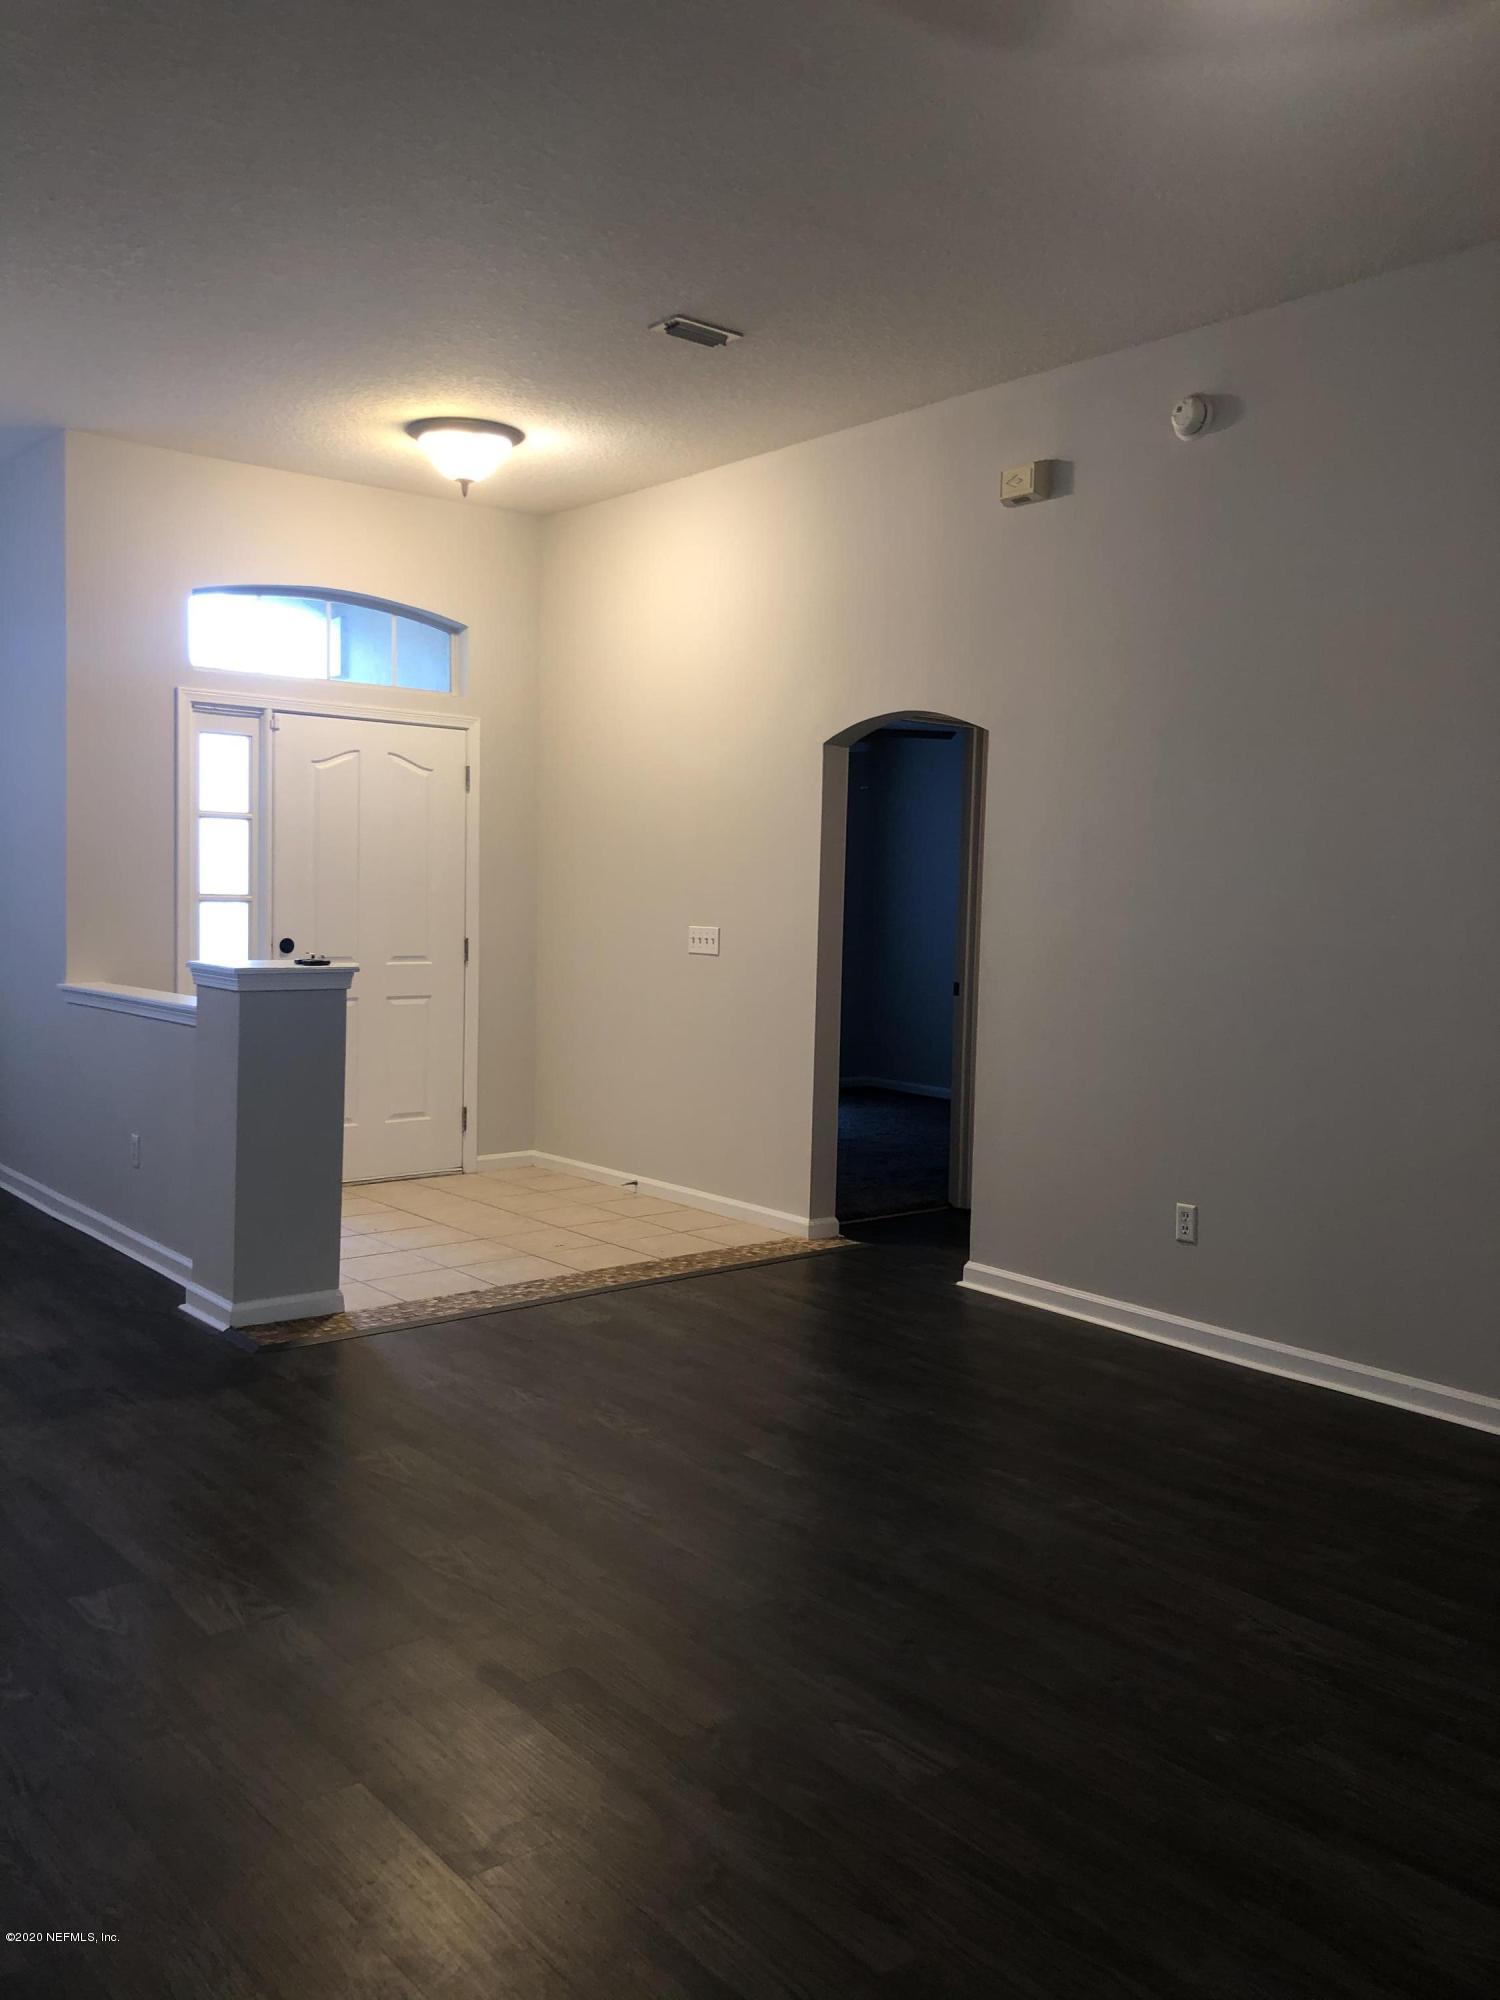 13102 CHETS CREEK, JACKSONVILLE, FLORIDA 32224, 3 Bedrooms Bedrooms, ,2 BathroomsBathrooms,Rental,For Rent,CHETS CREEK,1083394